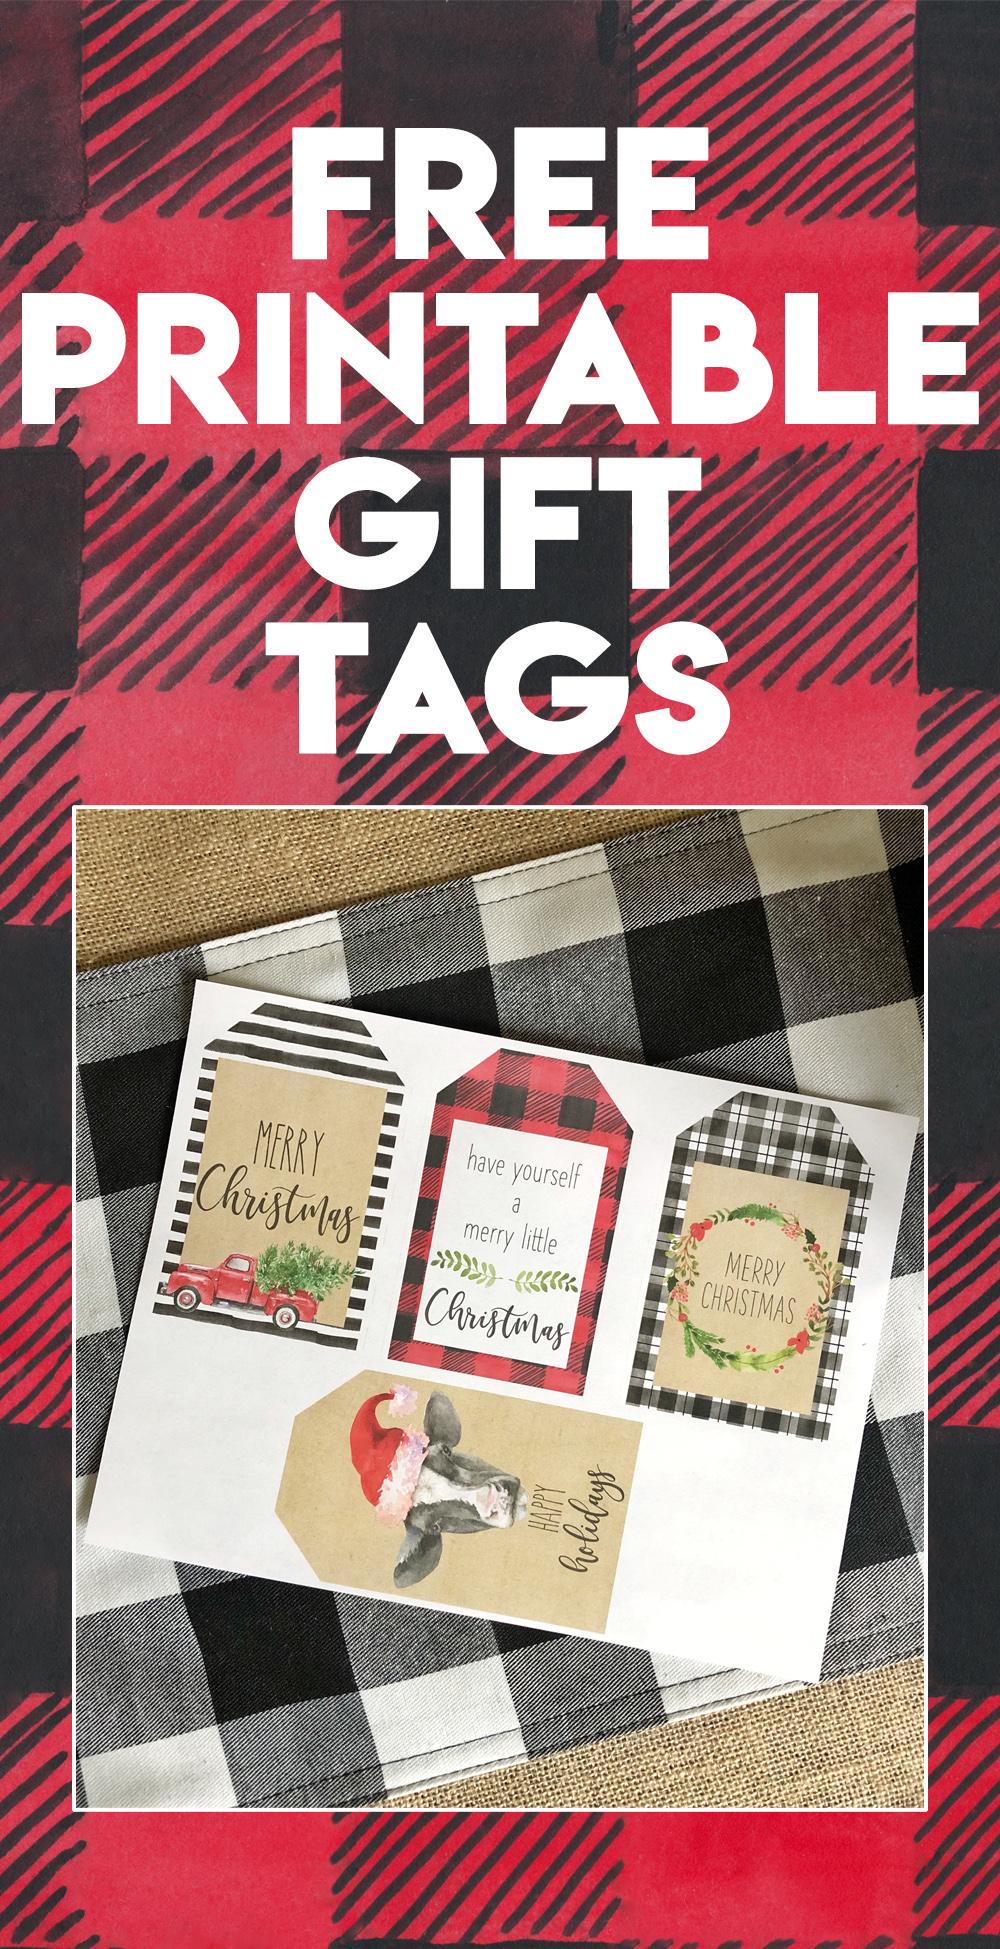 photograph about Printable Christmas Name Tags called Totally free Printable Xmas Reward Tags - Shanty 2 Stylish